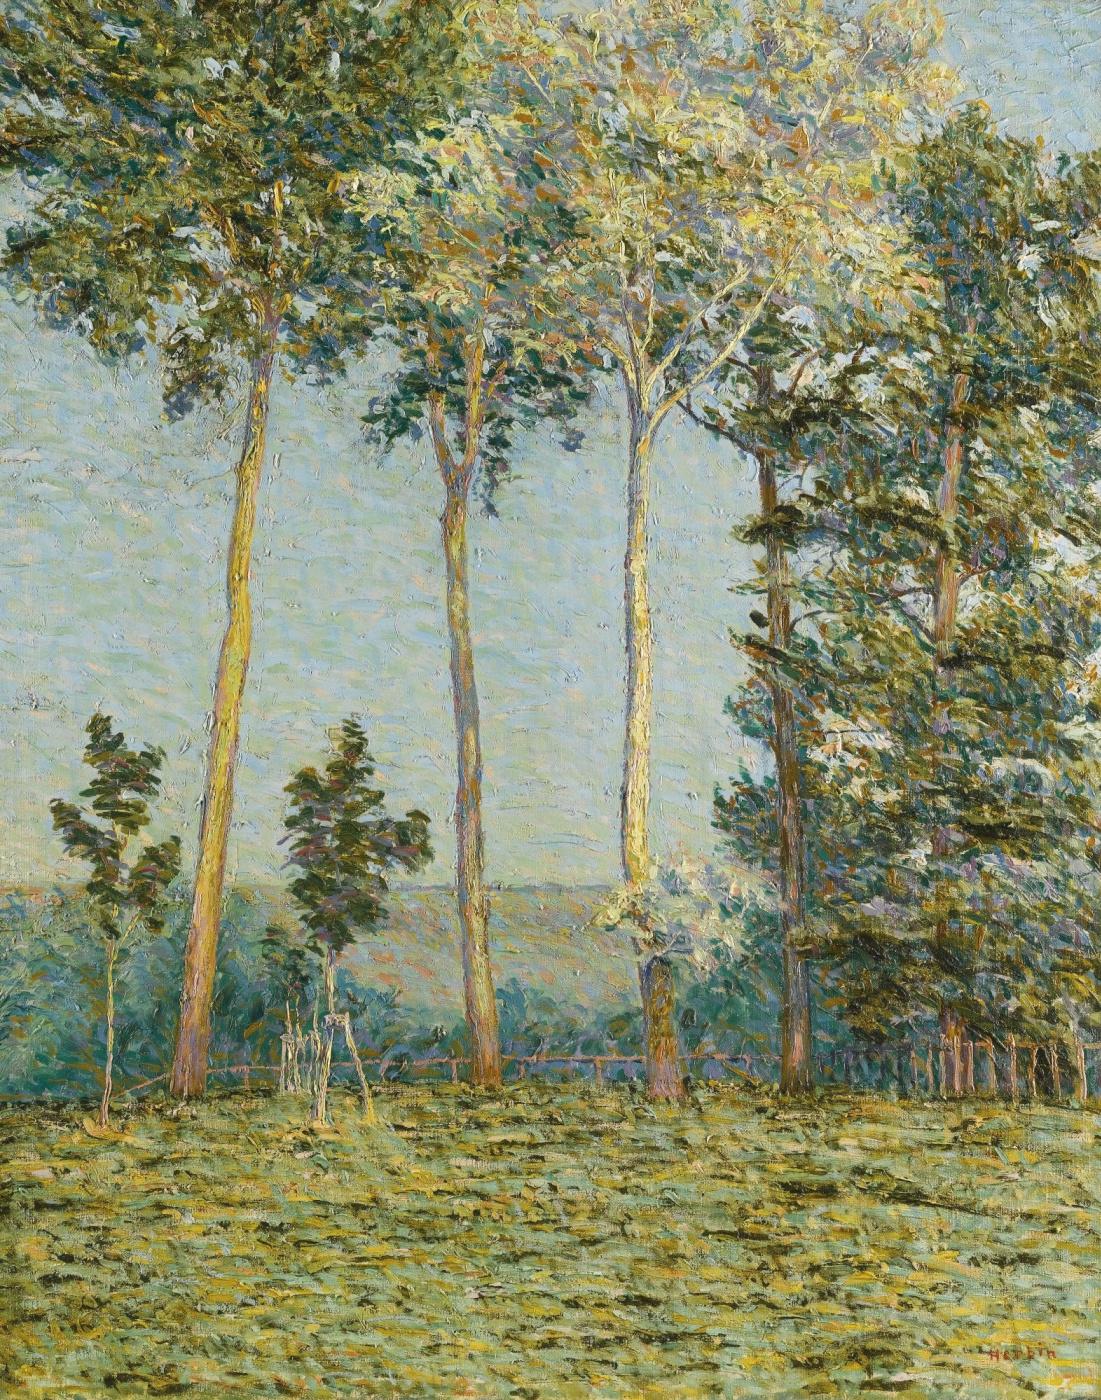 Auguste Erben. Landscape with large trees